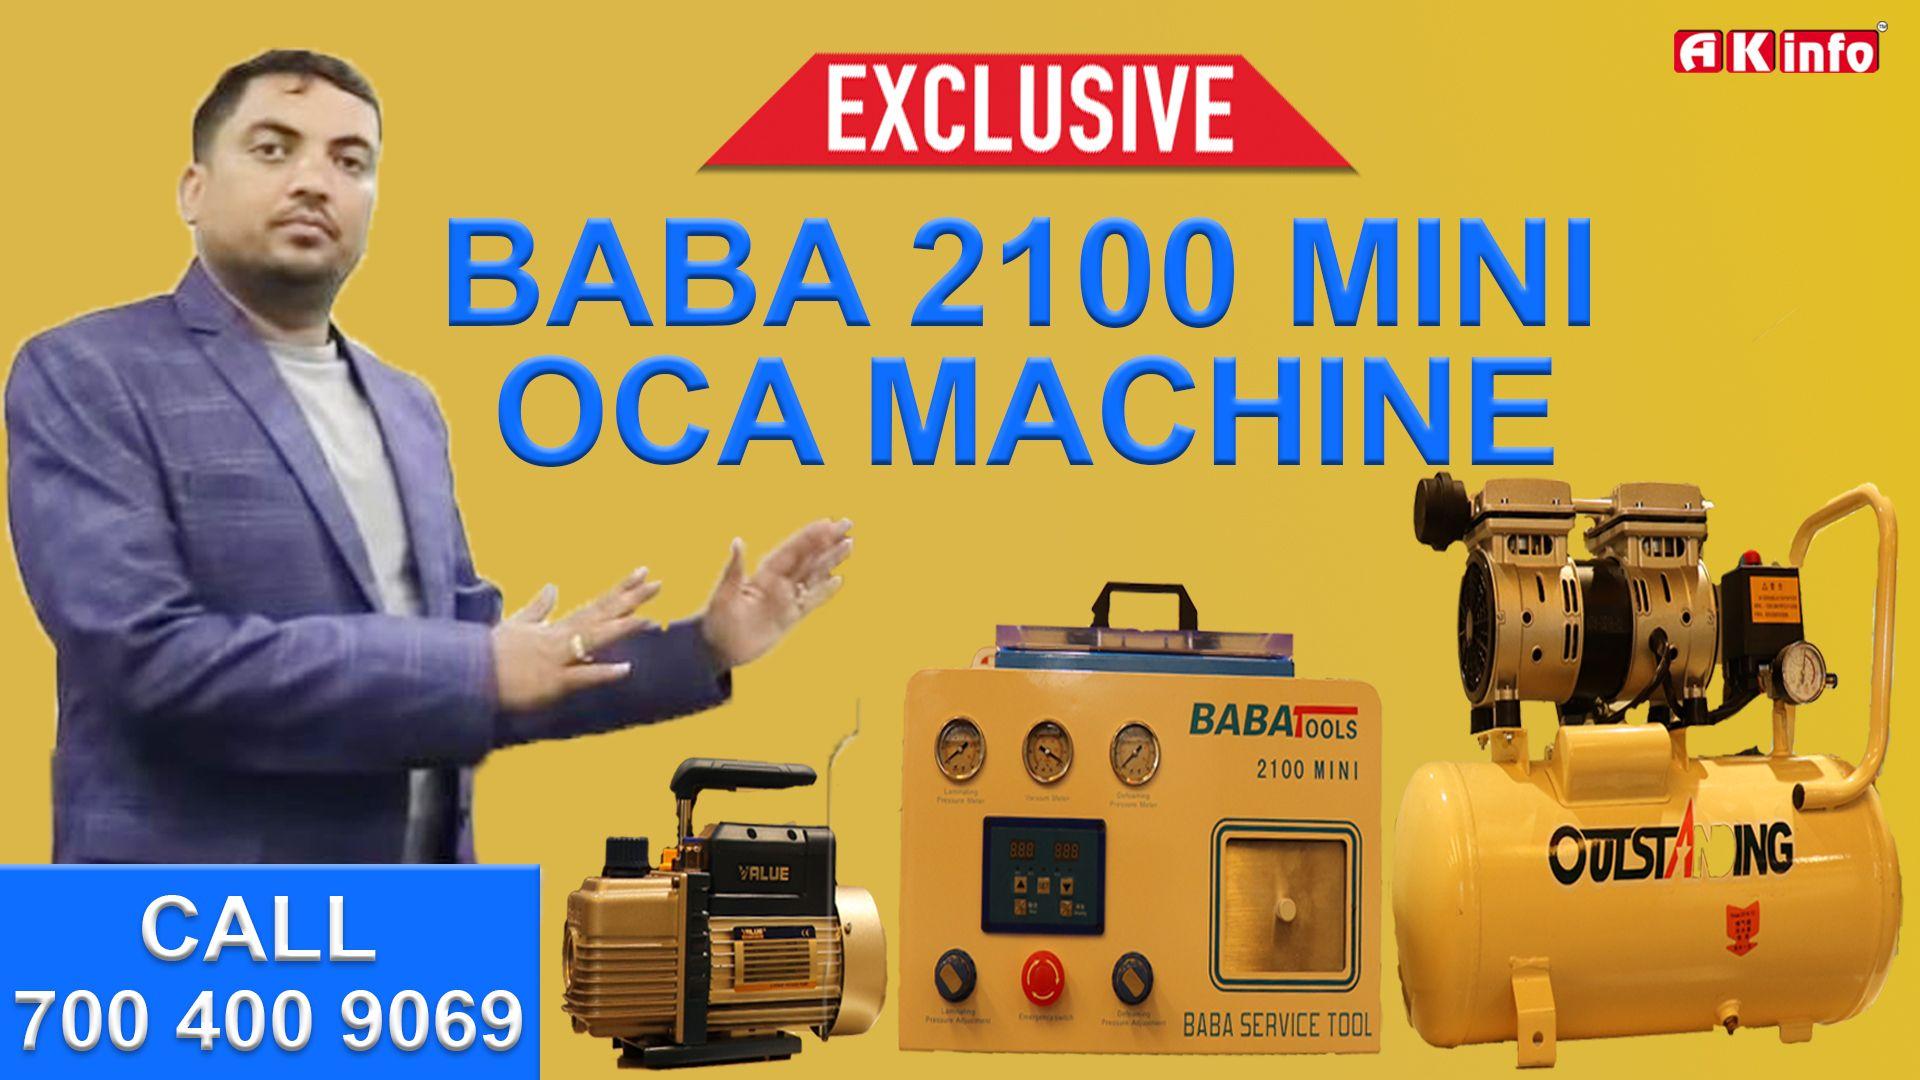 Baba 2100 Mini Oca Machine Mini Mobile Business New Gadgets